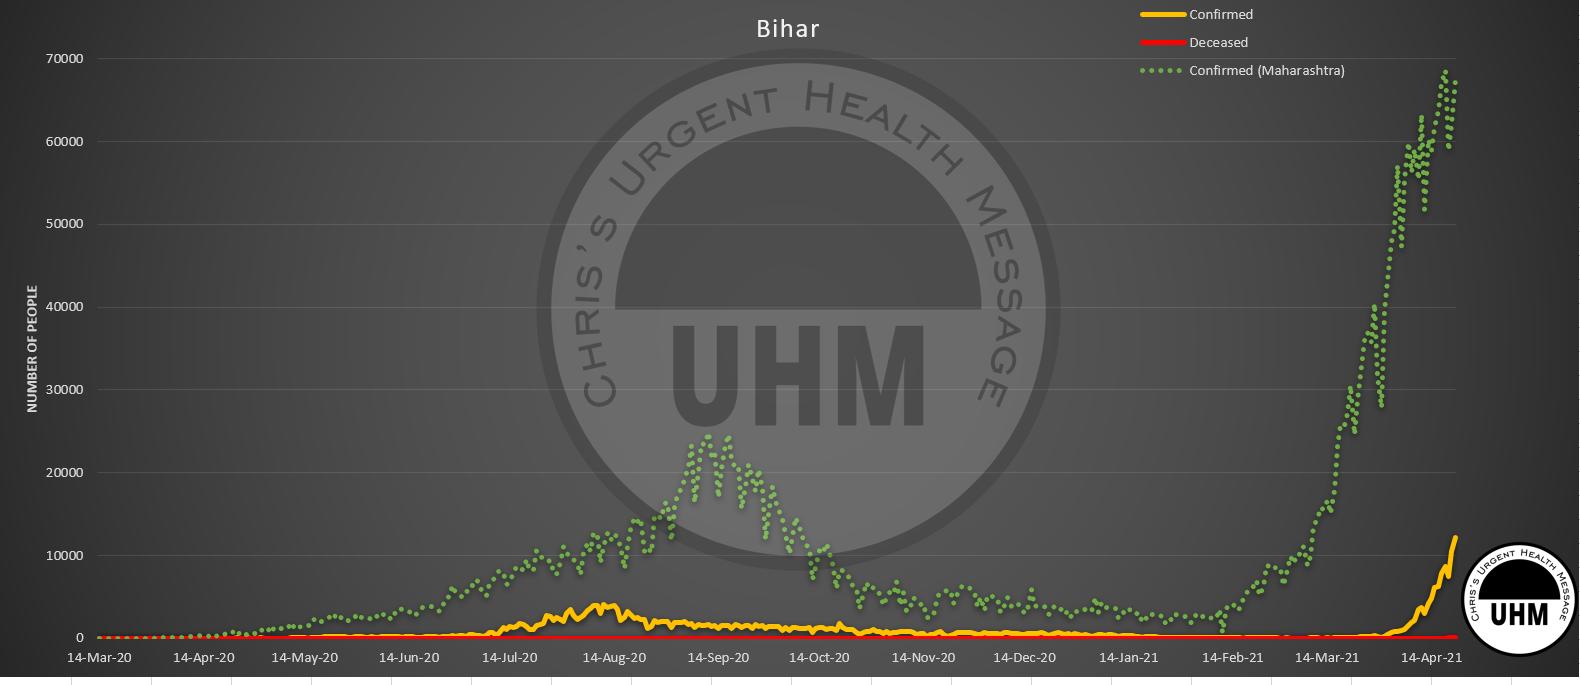 Coronavirus cases and deaths in Bihar